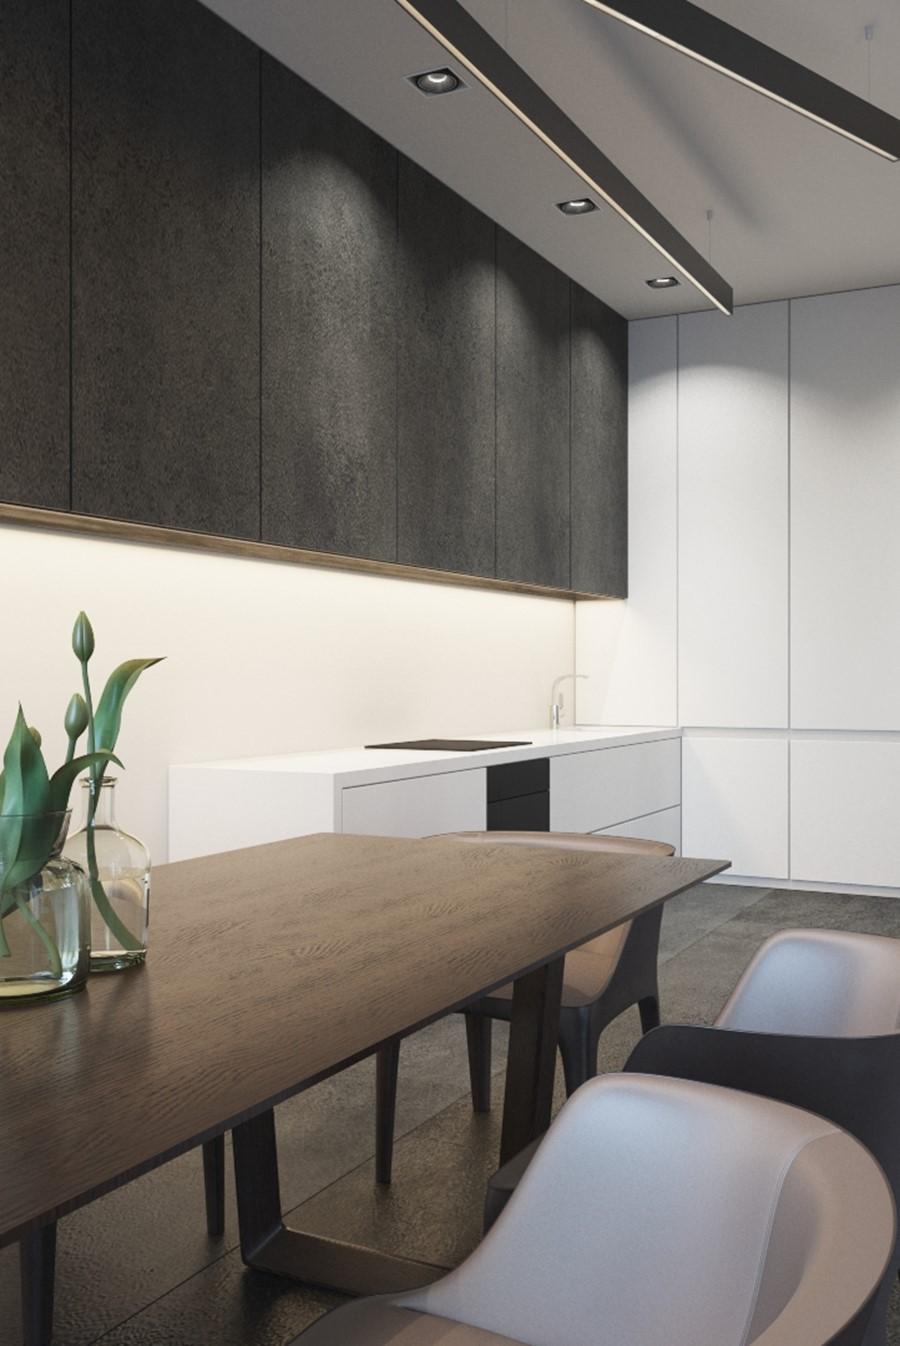 interior-design-by-alexander-neagara-06